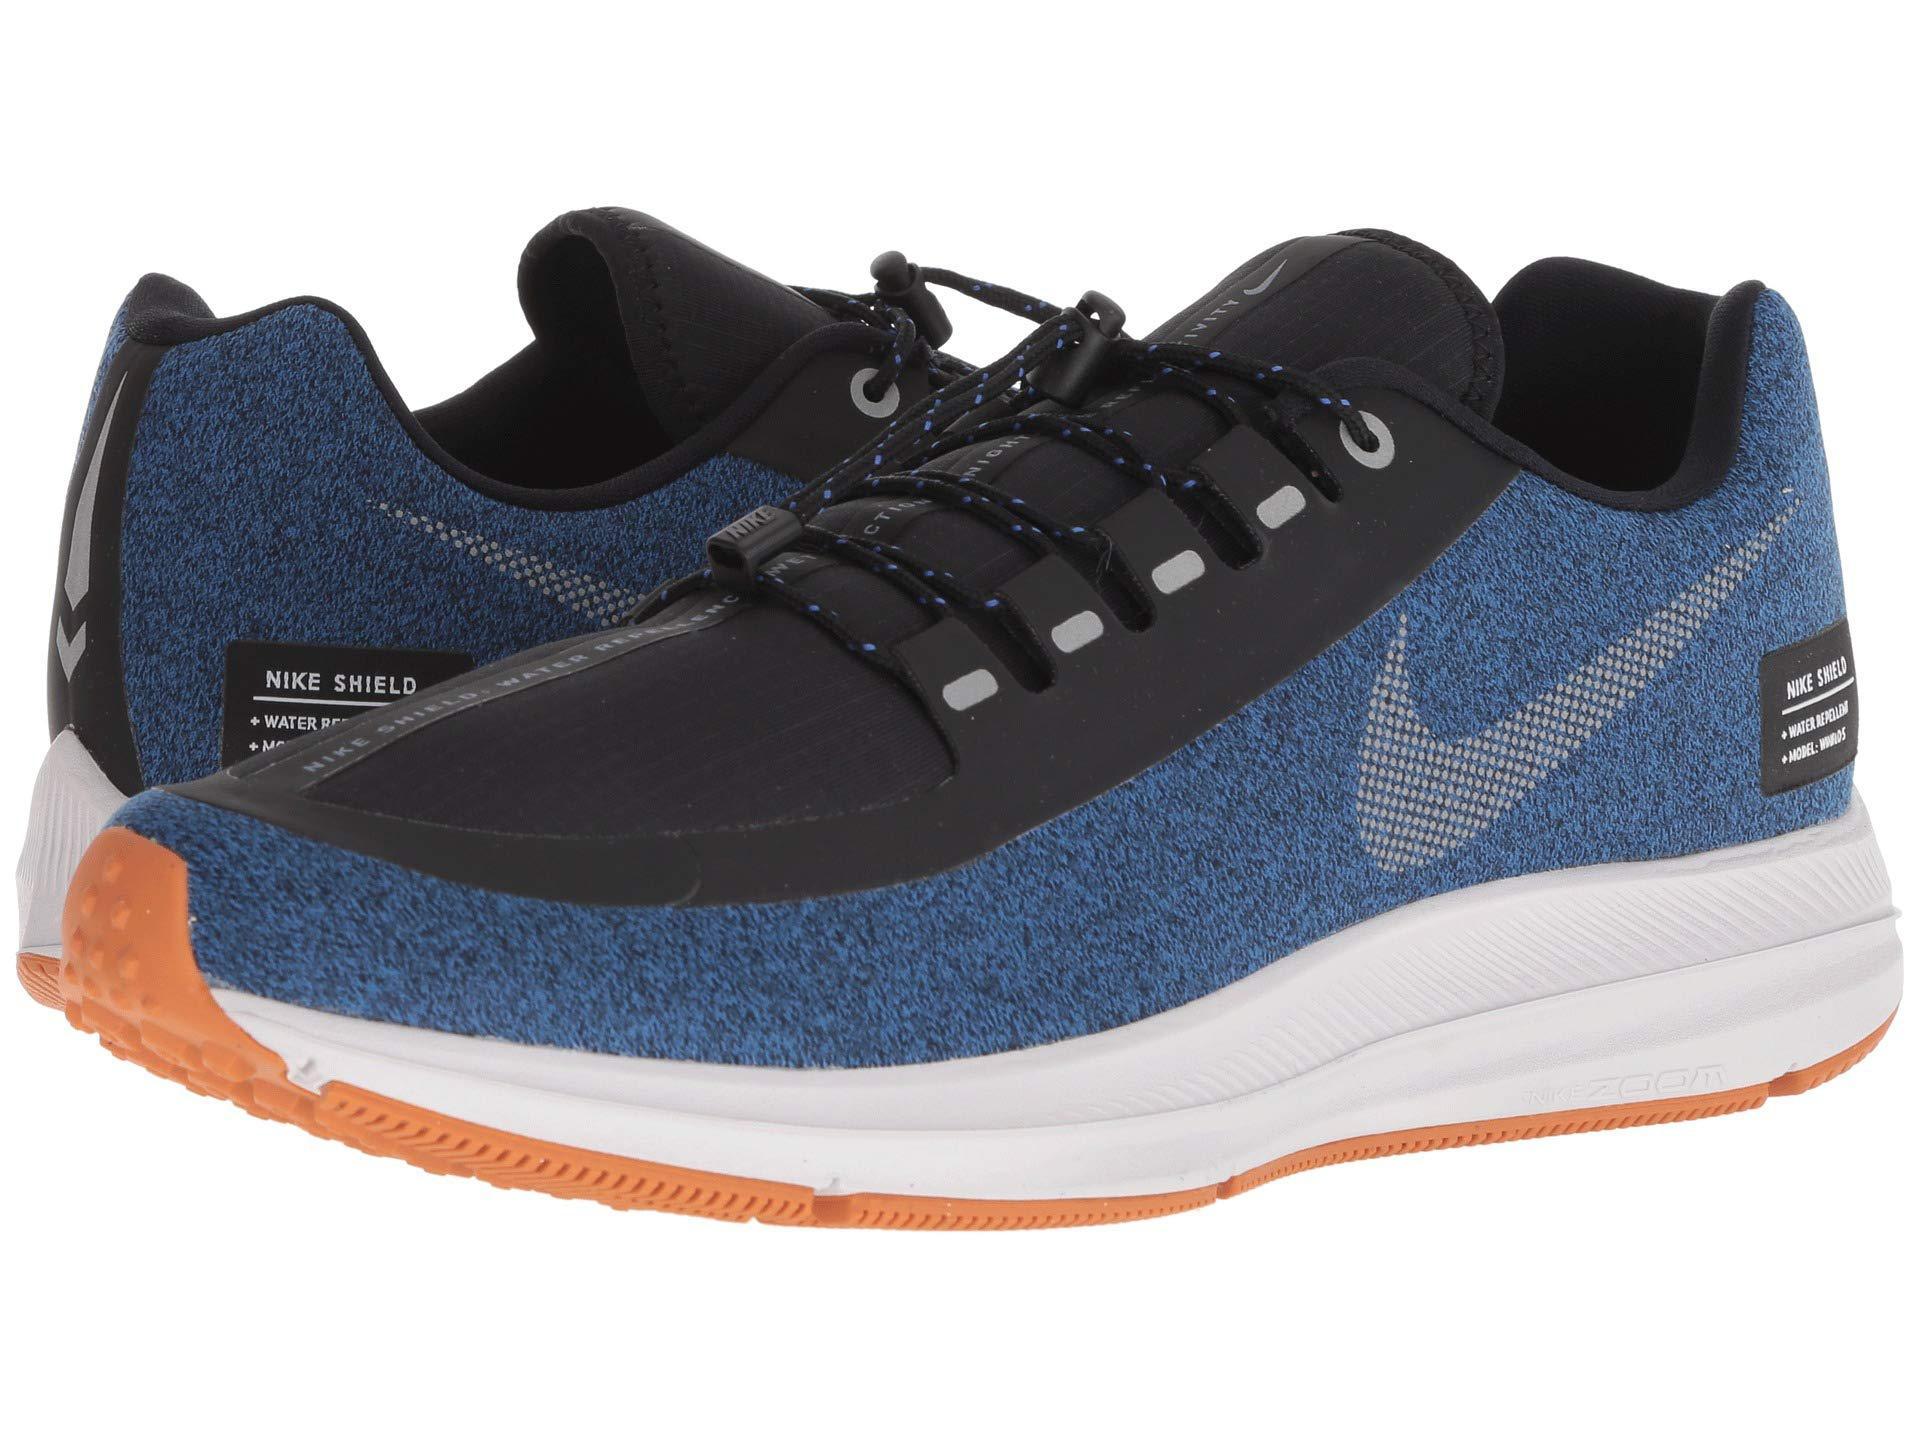 3e945b97af8cc Nike. Air Zoom Winflo 5 Run Shield (black metallic Silver hyper Royal) Men s  Running Shoes